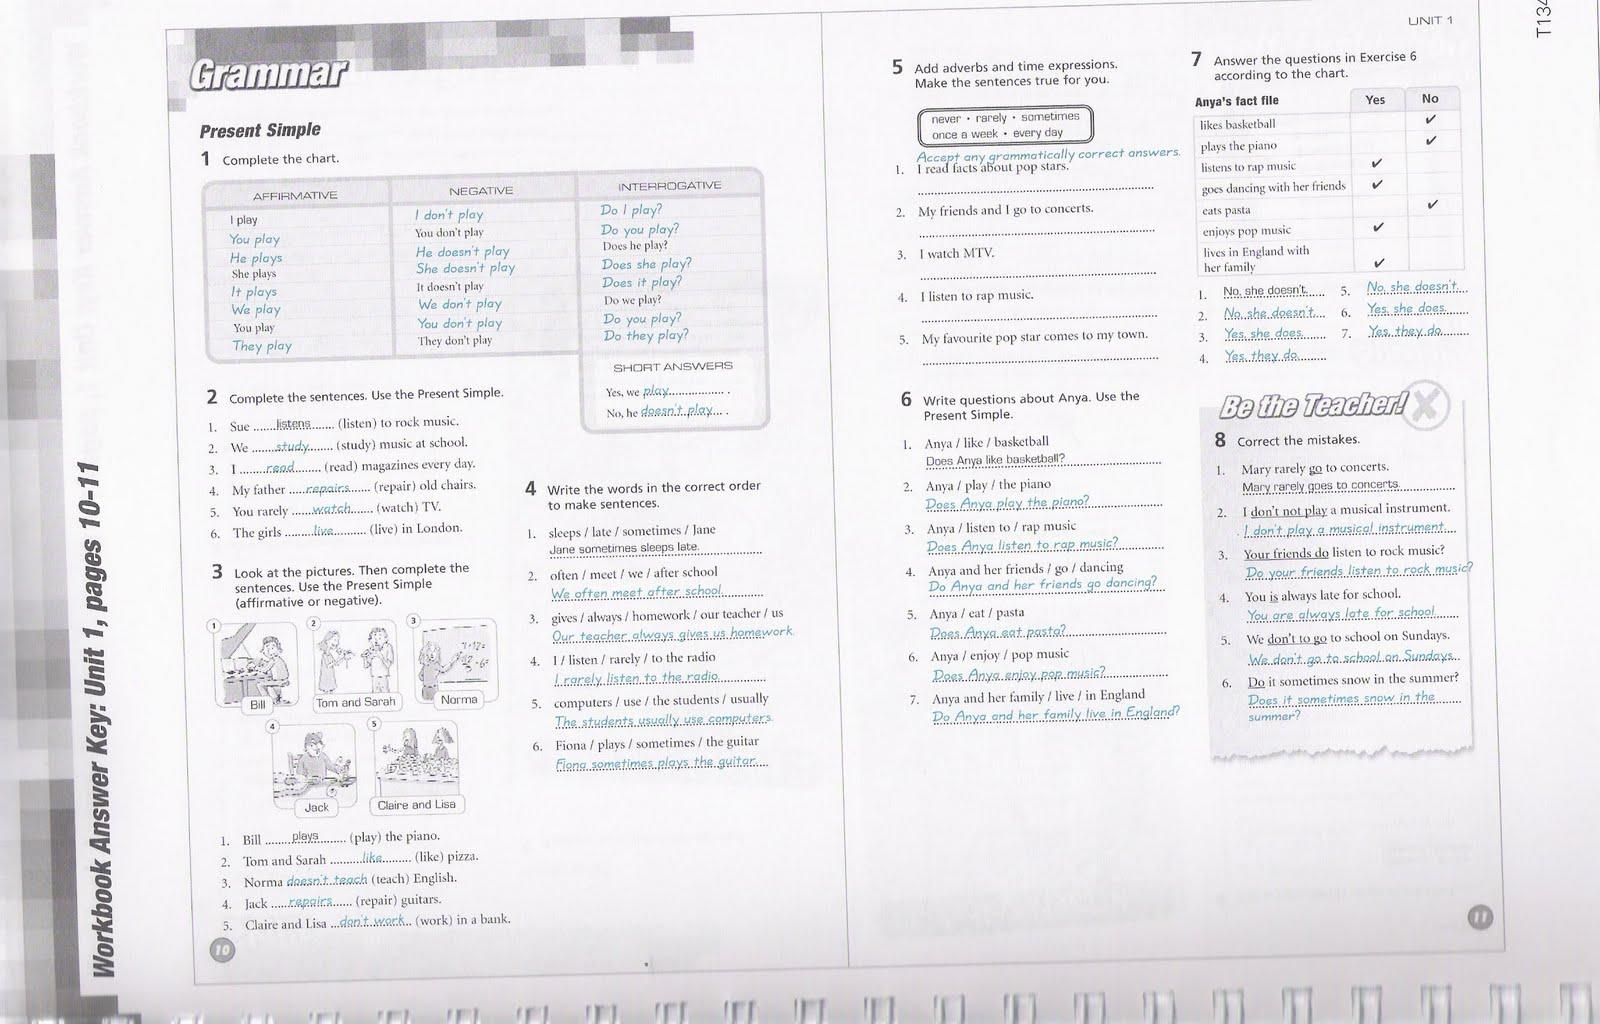 Workbooks realidades 2 workbook answer key : 3rd ESO ANSWERS workbook pages 10 and 11 Â« Pushingenglish Blog